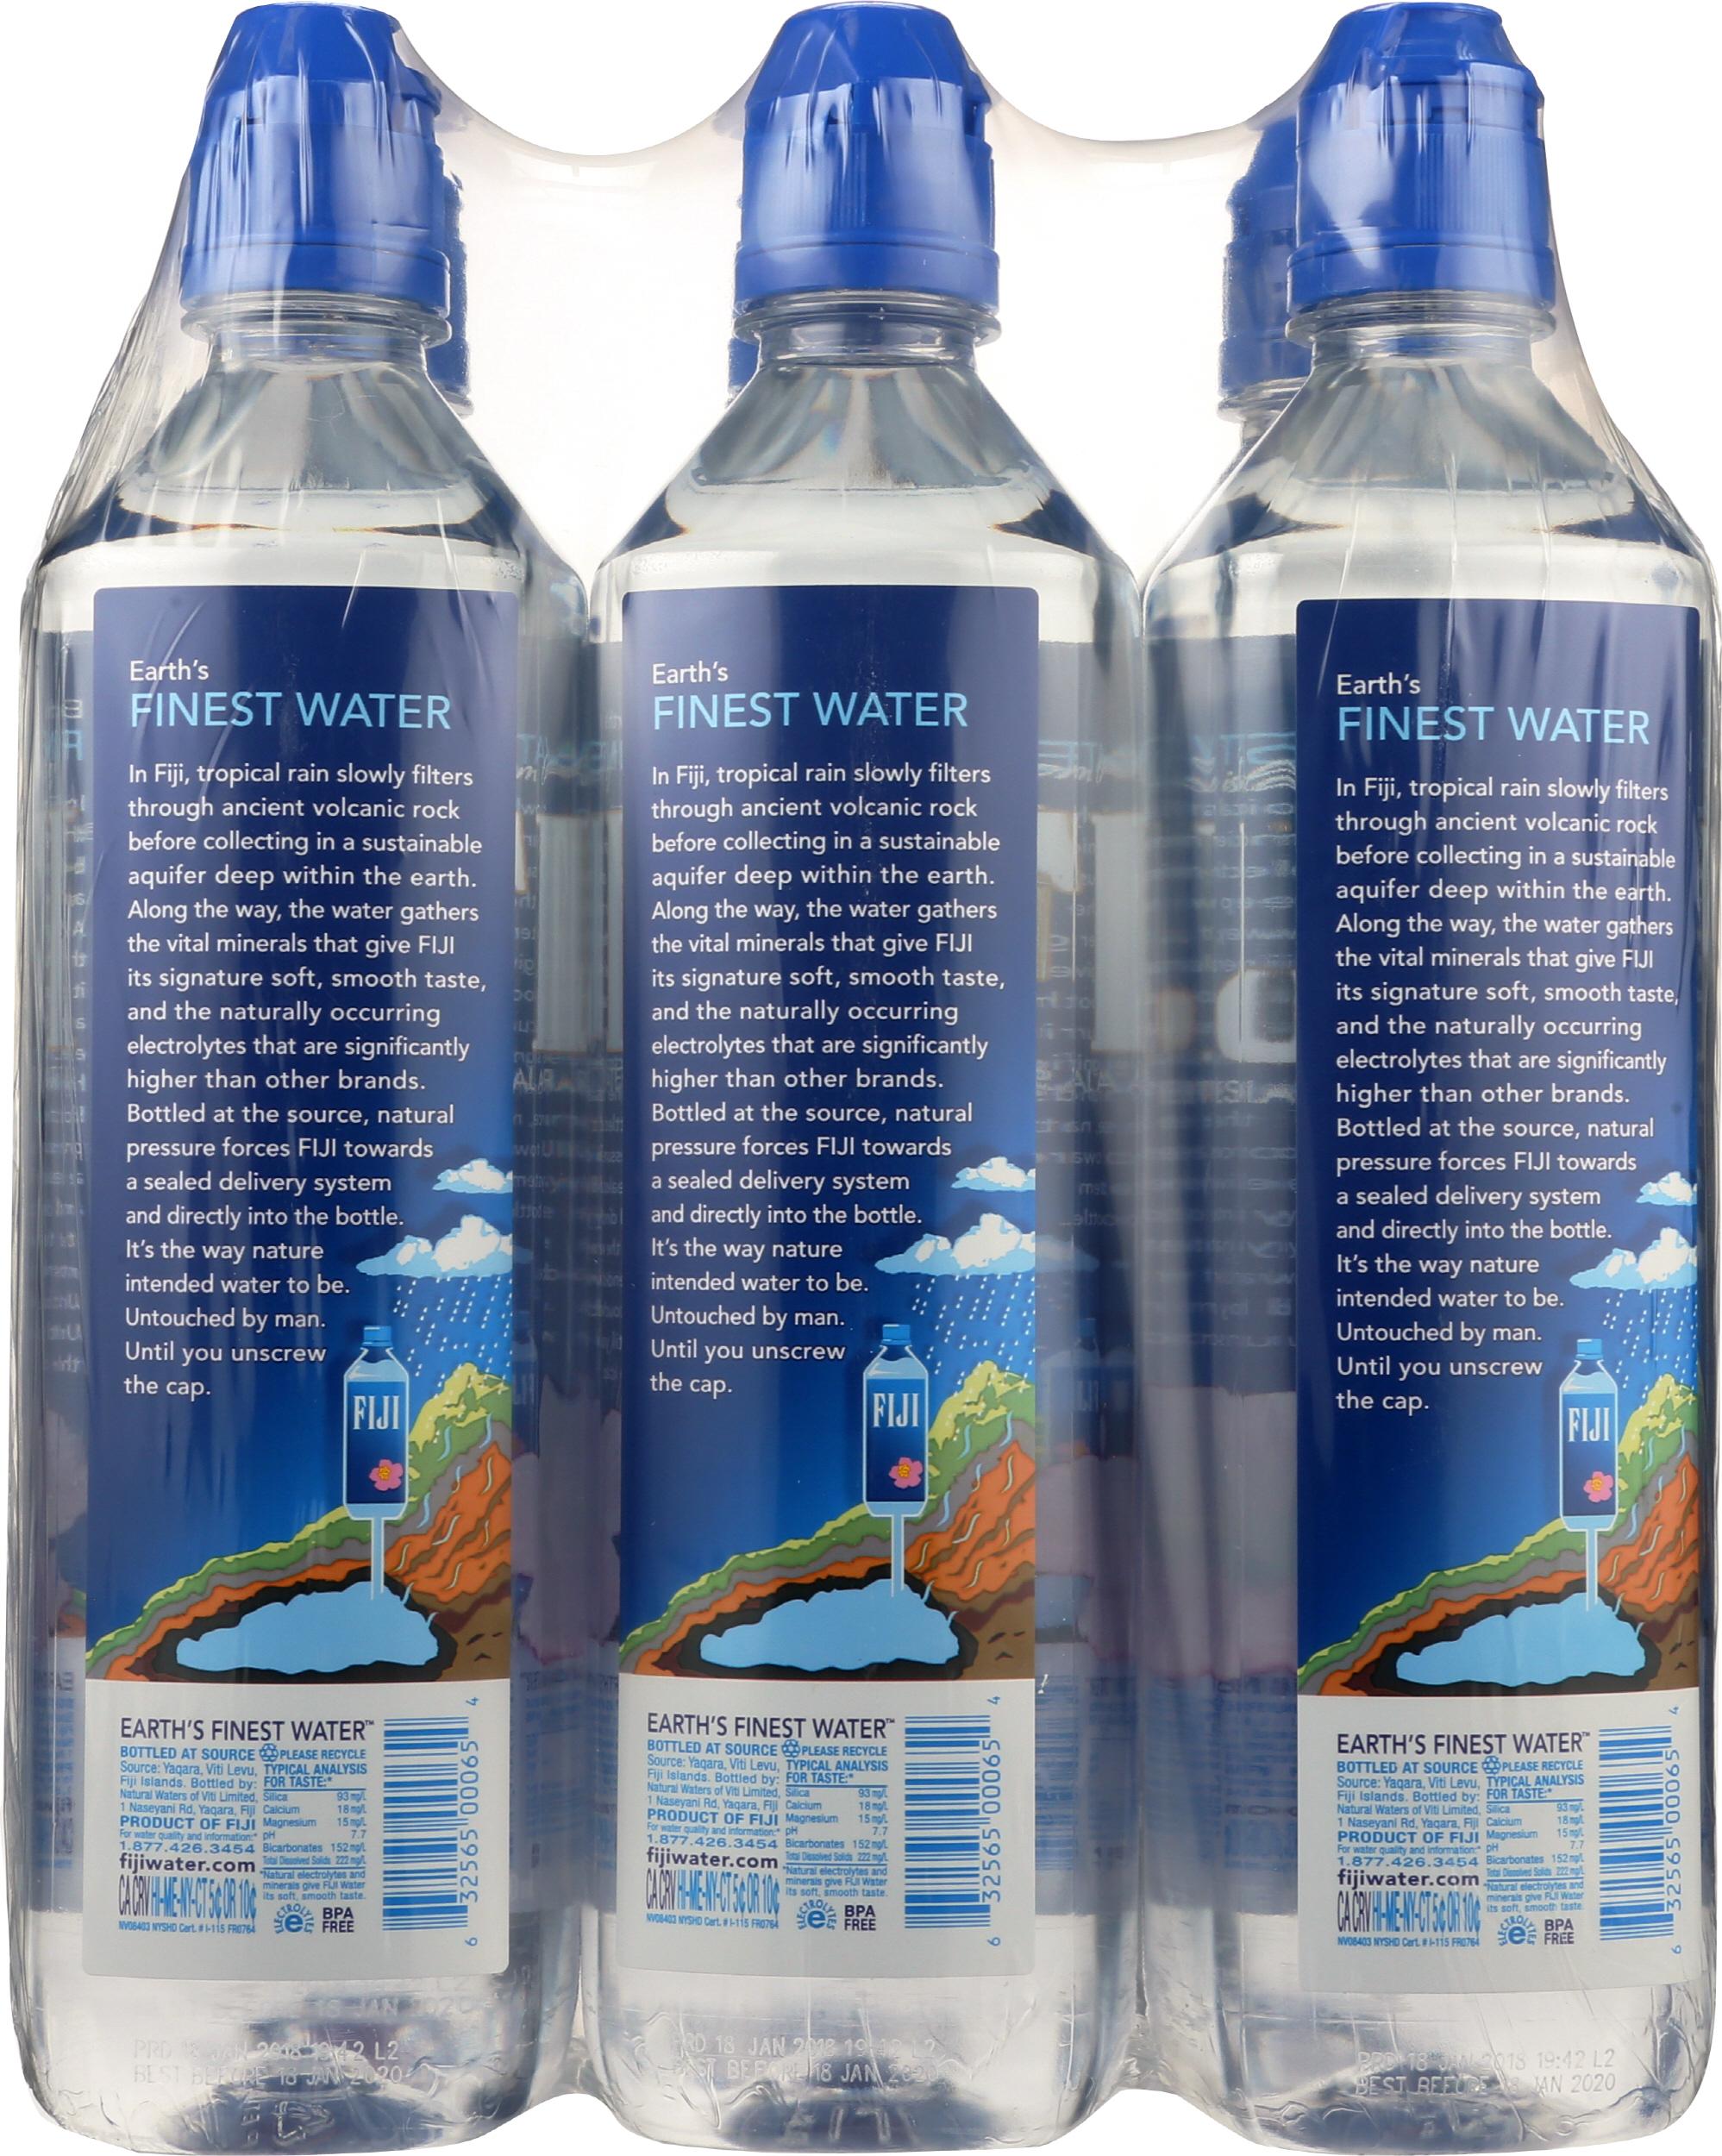 Fiji Water Water Artisan Natural 700 Ml Buy Fiji Water Water Artisan Natural Fiji Water Water Natural Fiji Water Water Natural Beverage Product On